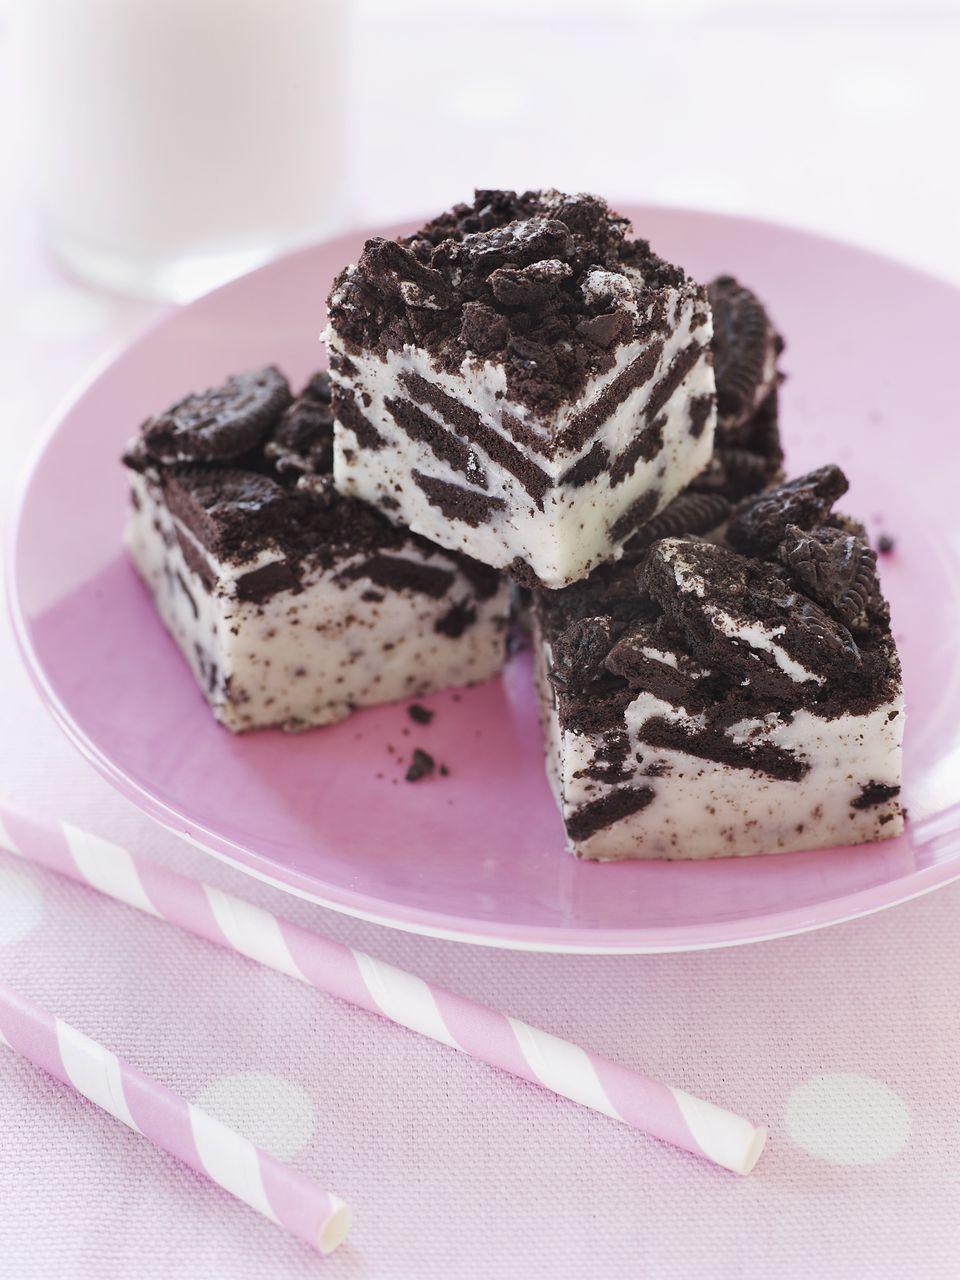 Oreo cookie dessert